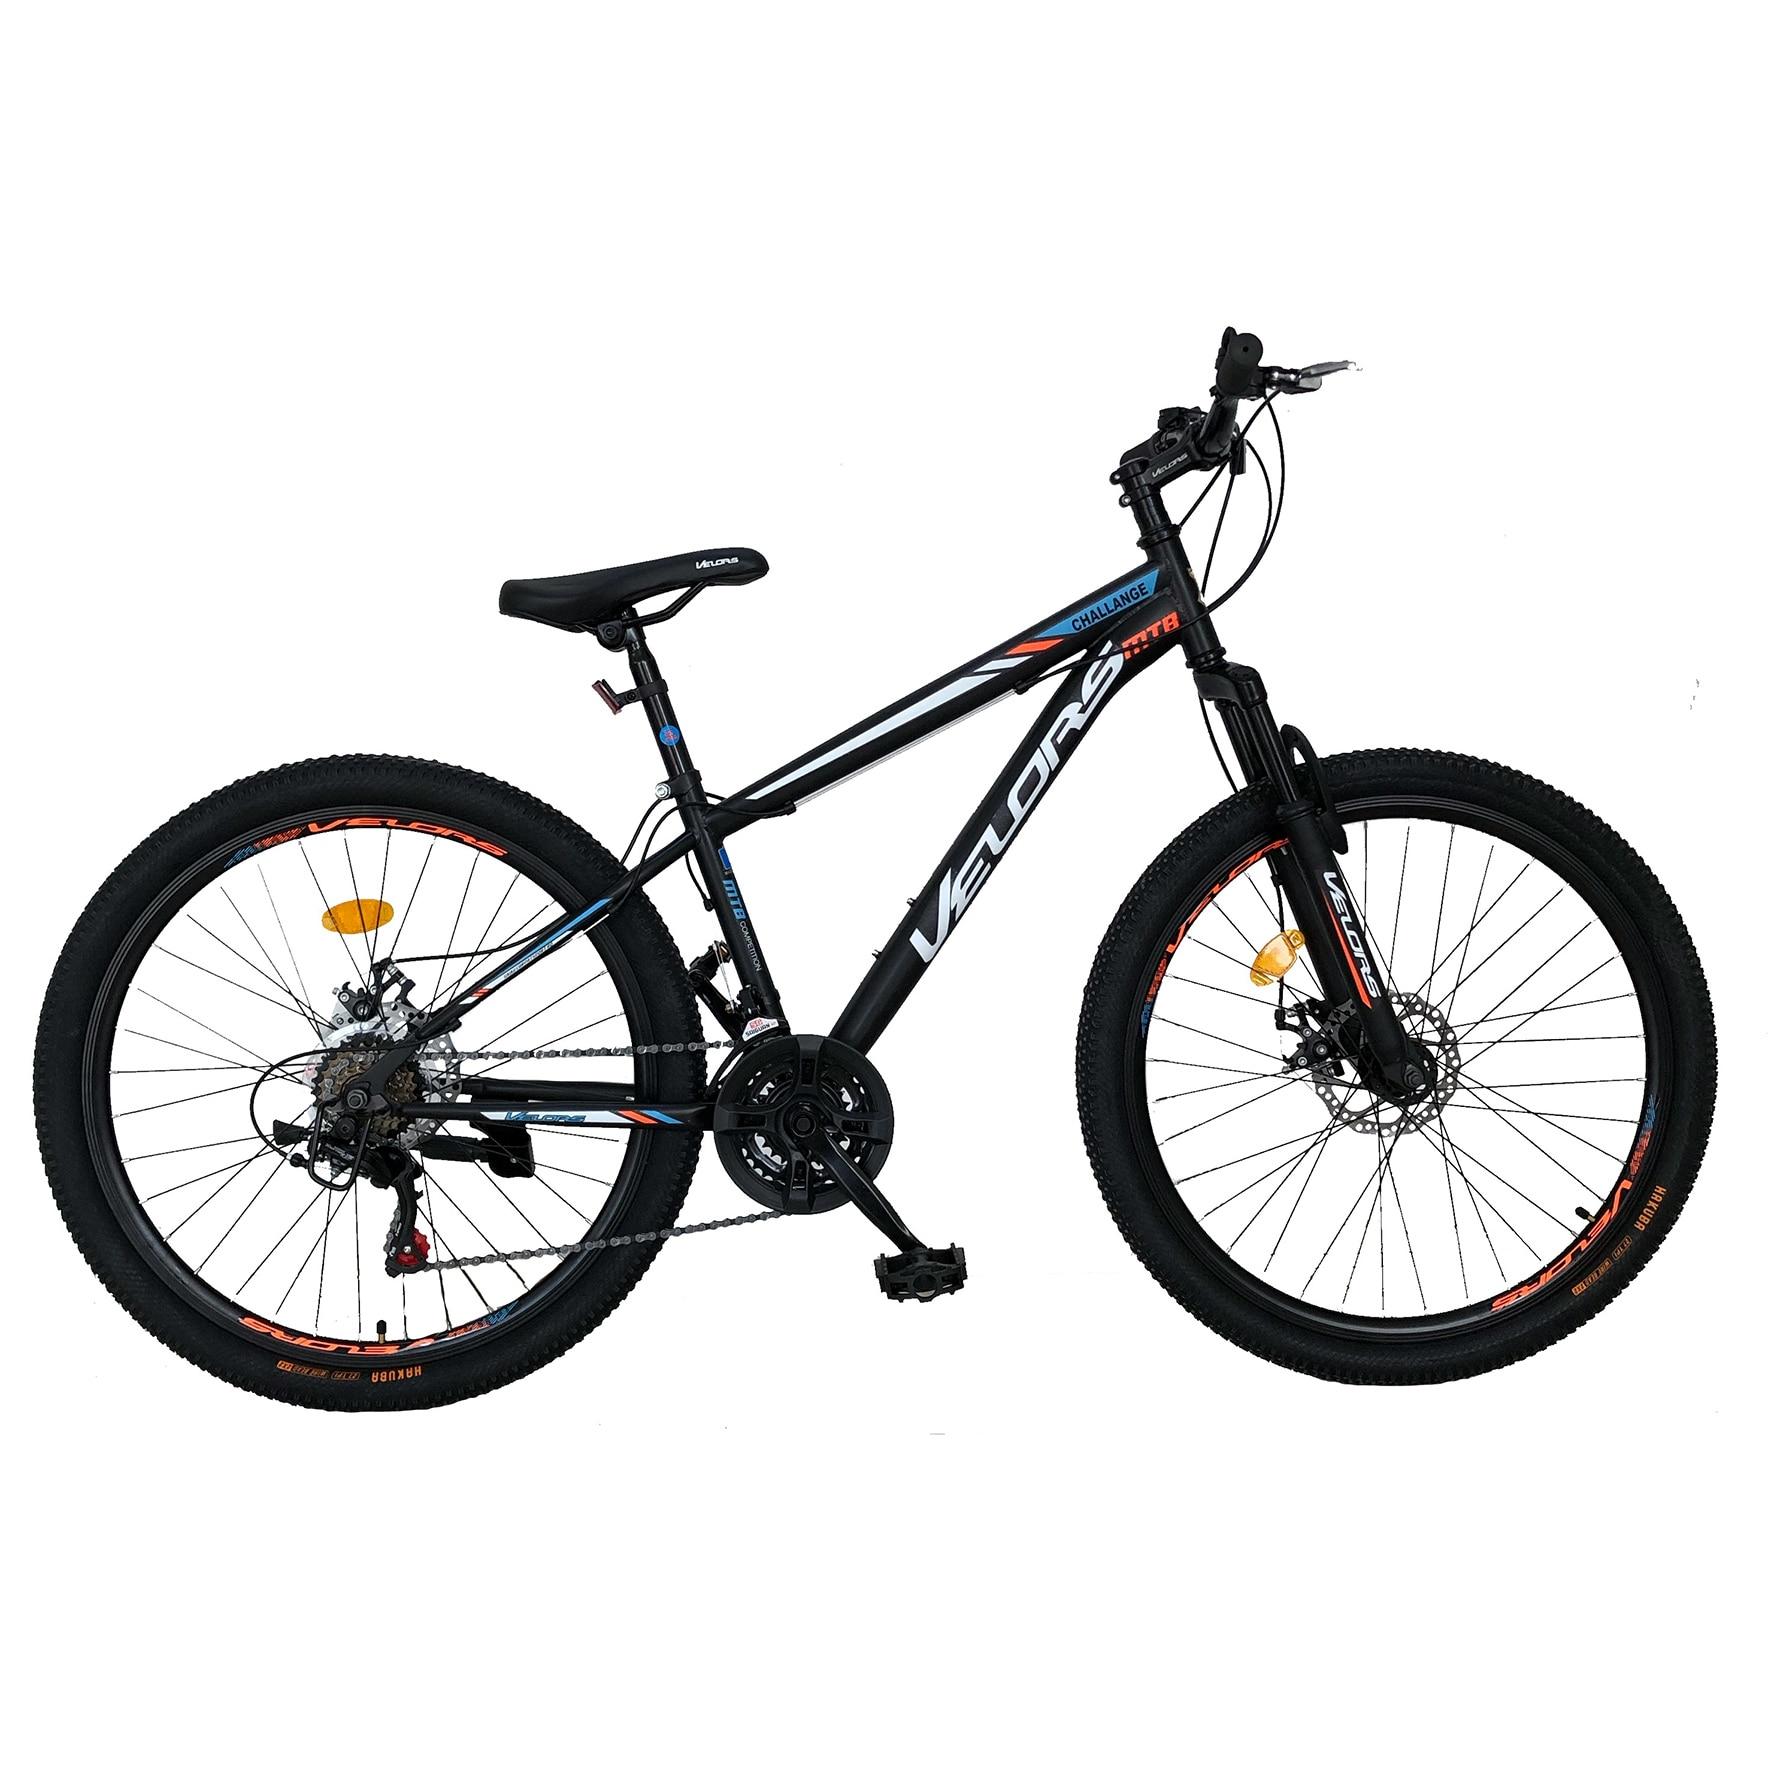 "Fotografie Bicicleta MTB 26"" Velors Challenge V2610A, Roti 26 Inch, Manete Schimbator Secventiale 21 Viteze, Frane Disc fata/spate, Negru/Alb/Portocaliu"